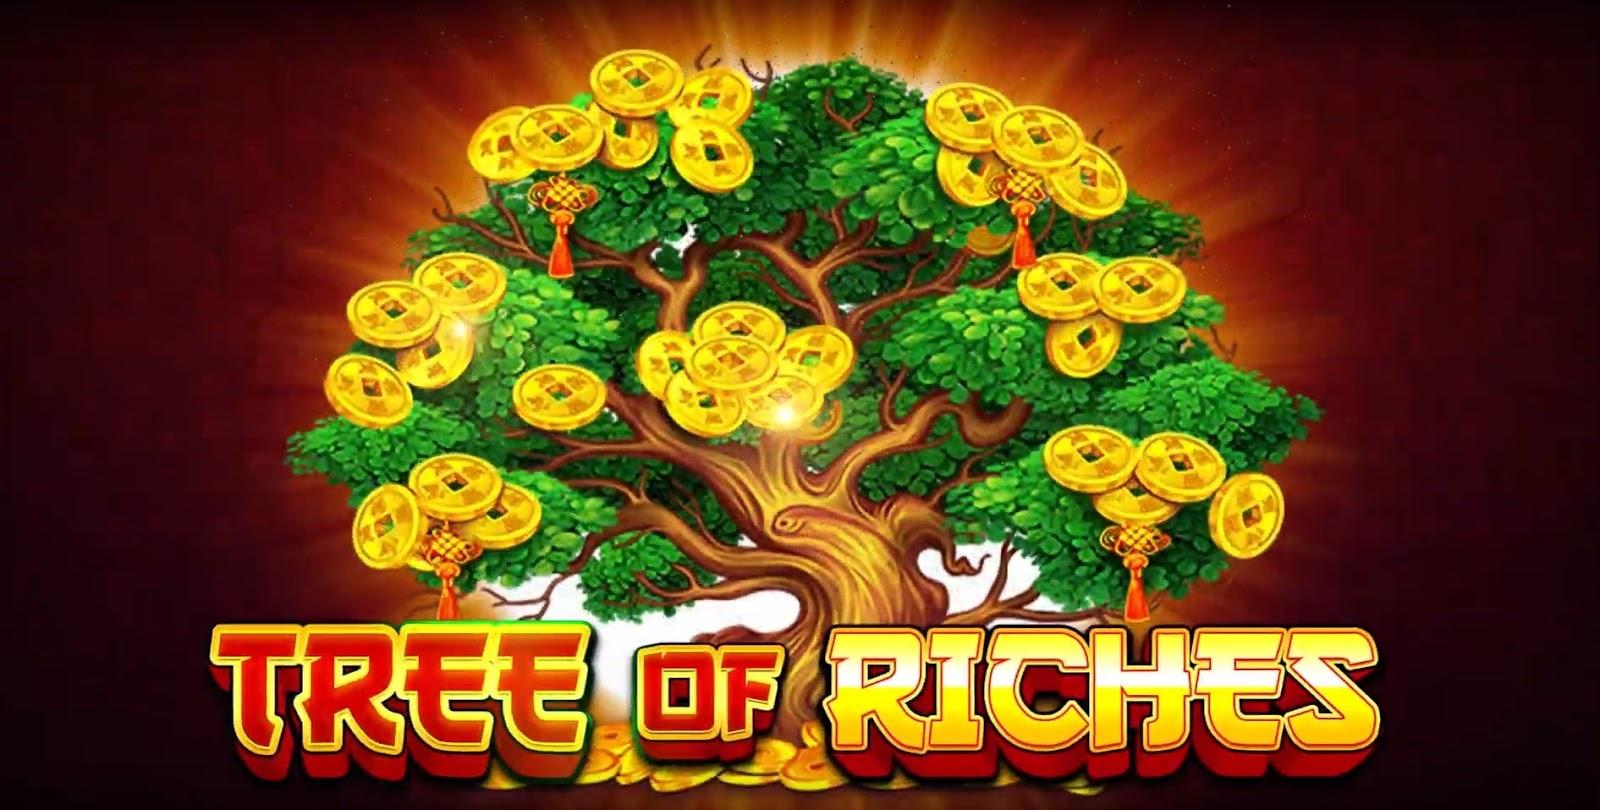 Game Judi Slot Online Tree Of Riches Pragmatic Play Resmi